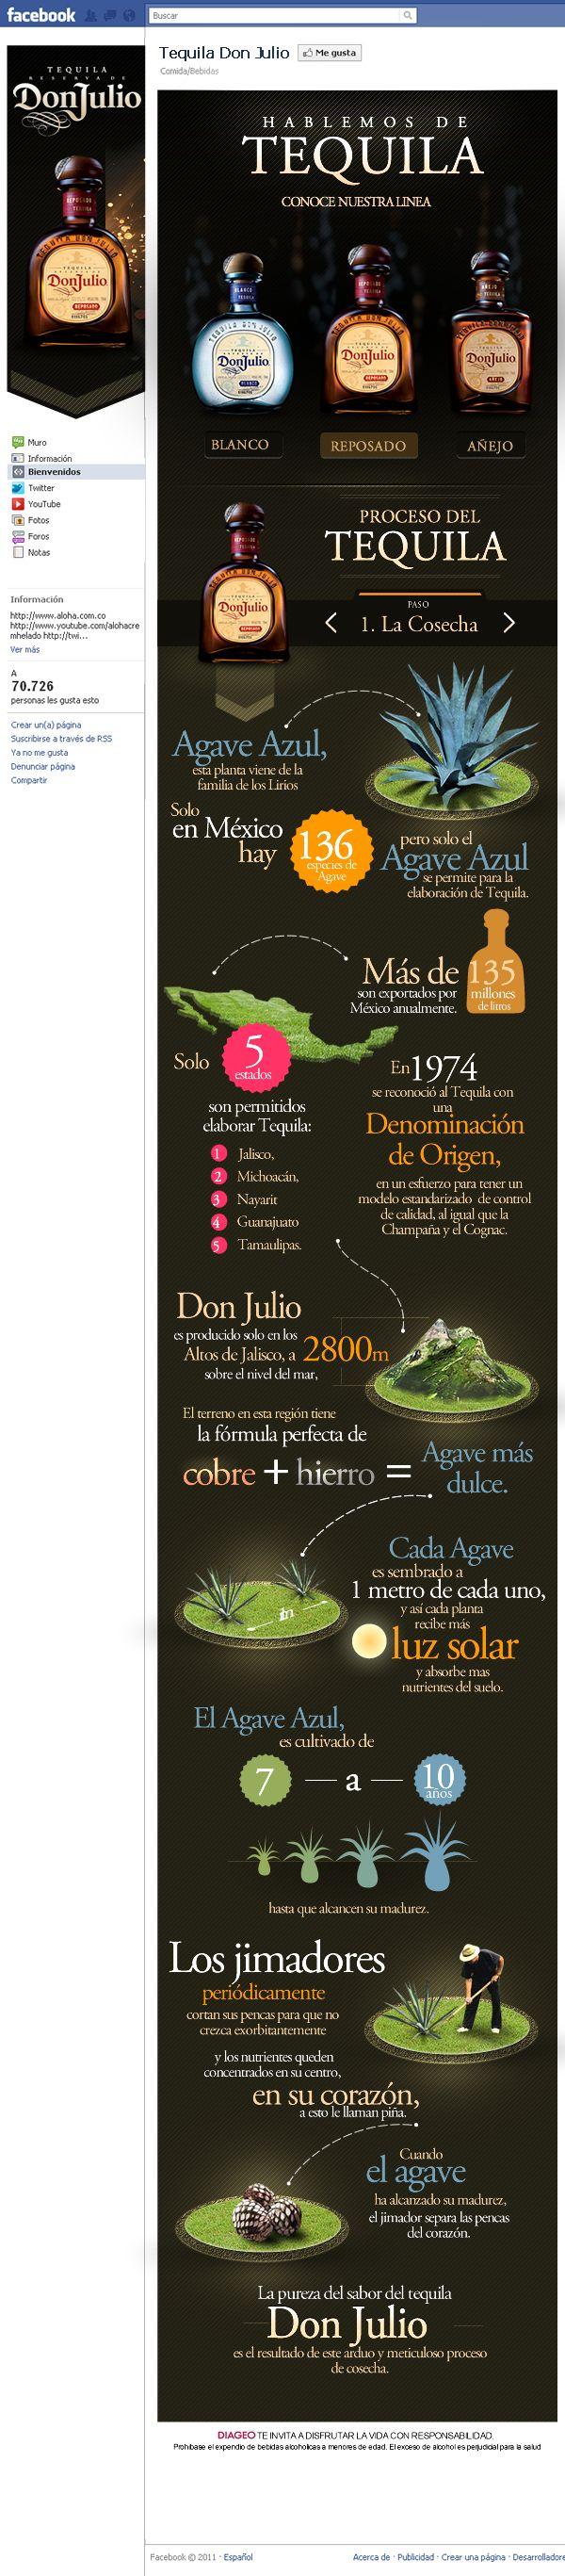 Tequila Don Julio Facebook